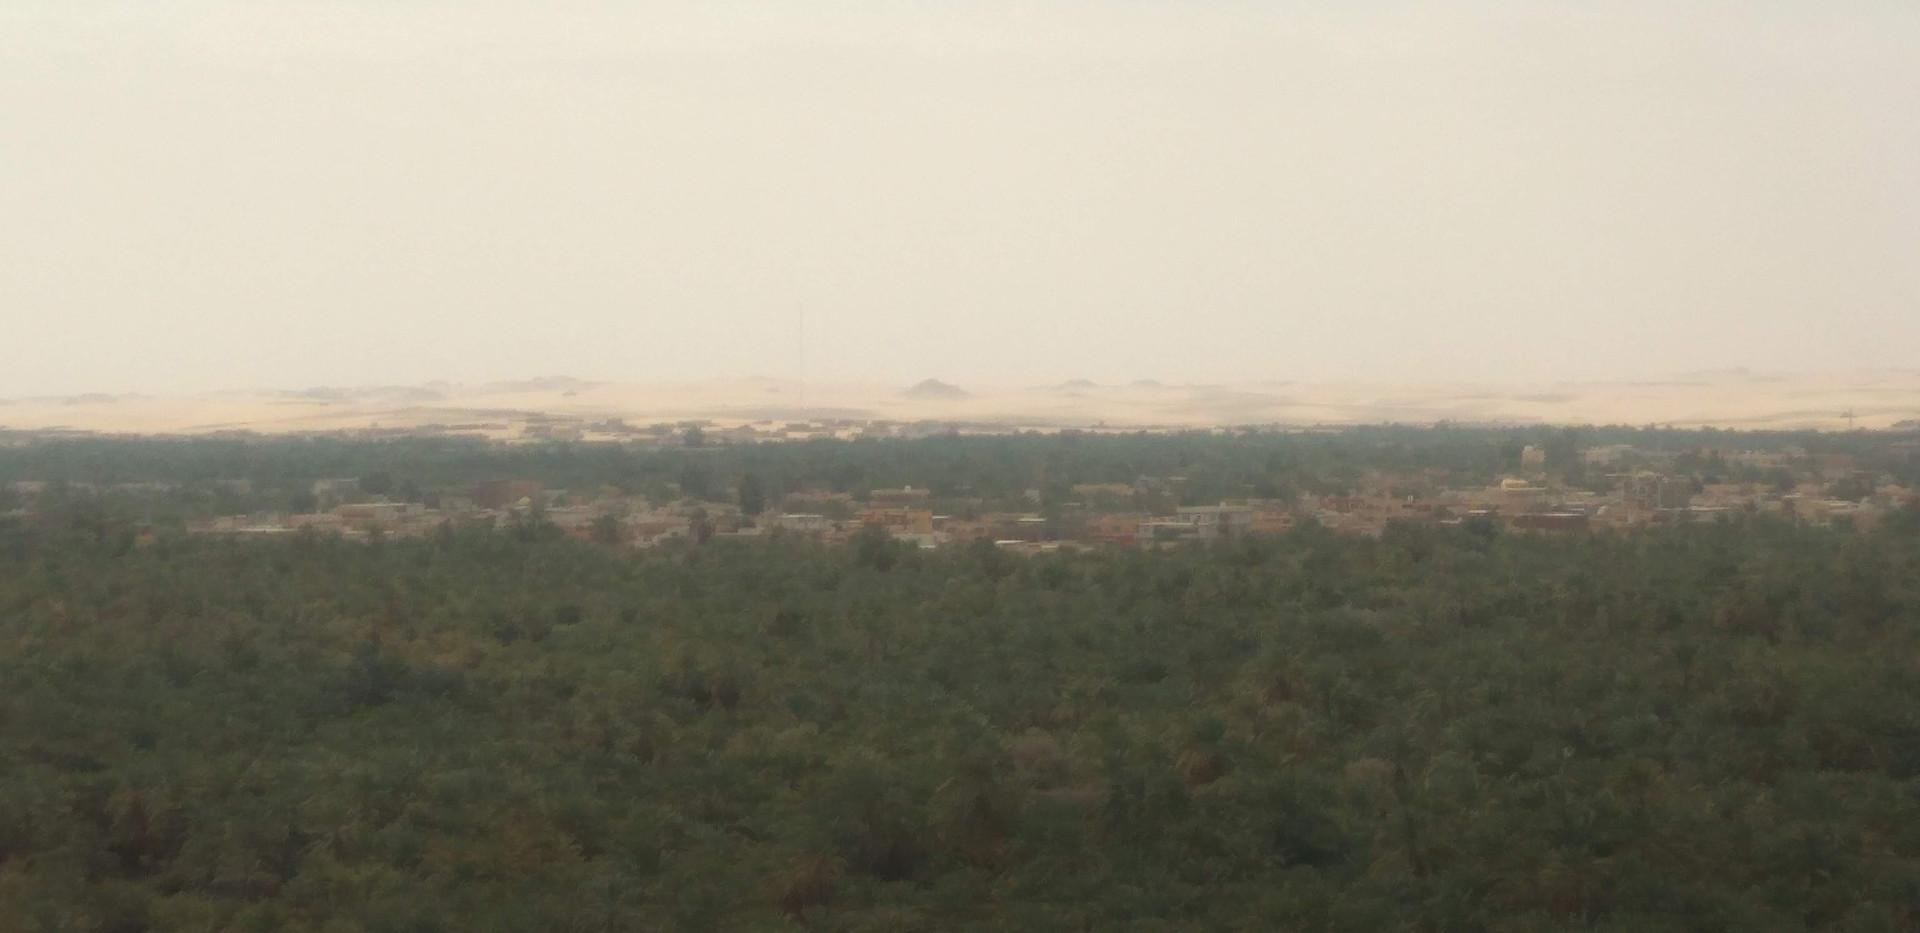 Biggest plantation of trees